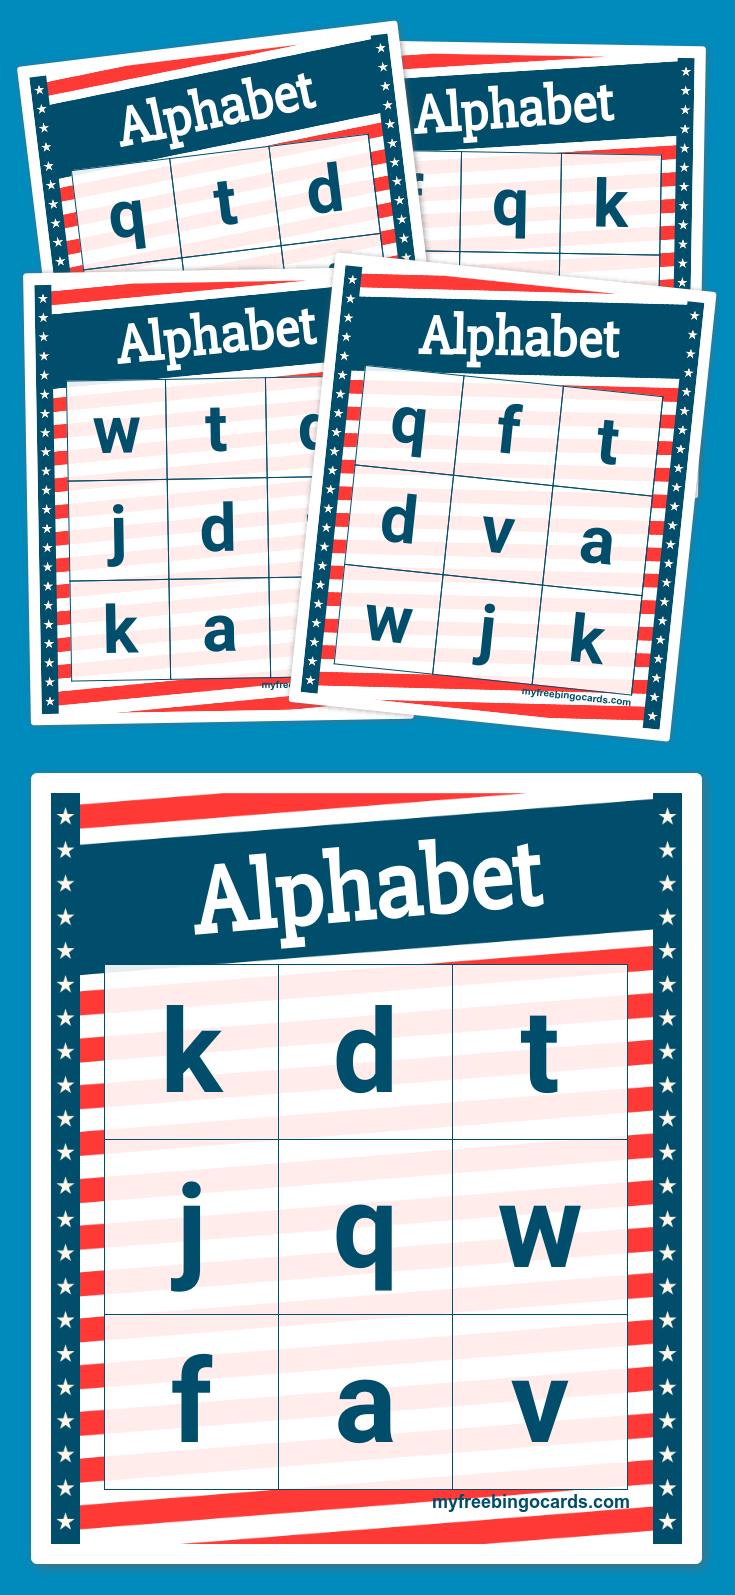 Free Printable Bingo Cards Bingo cards printable, Bingo